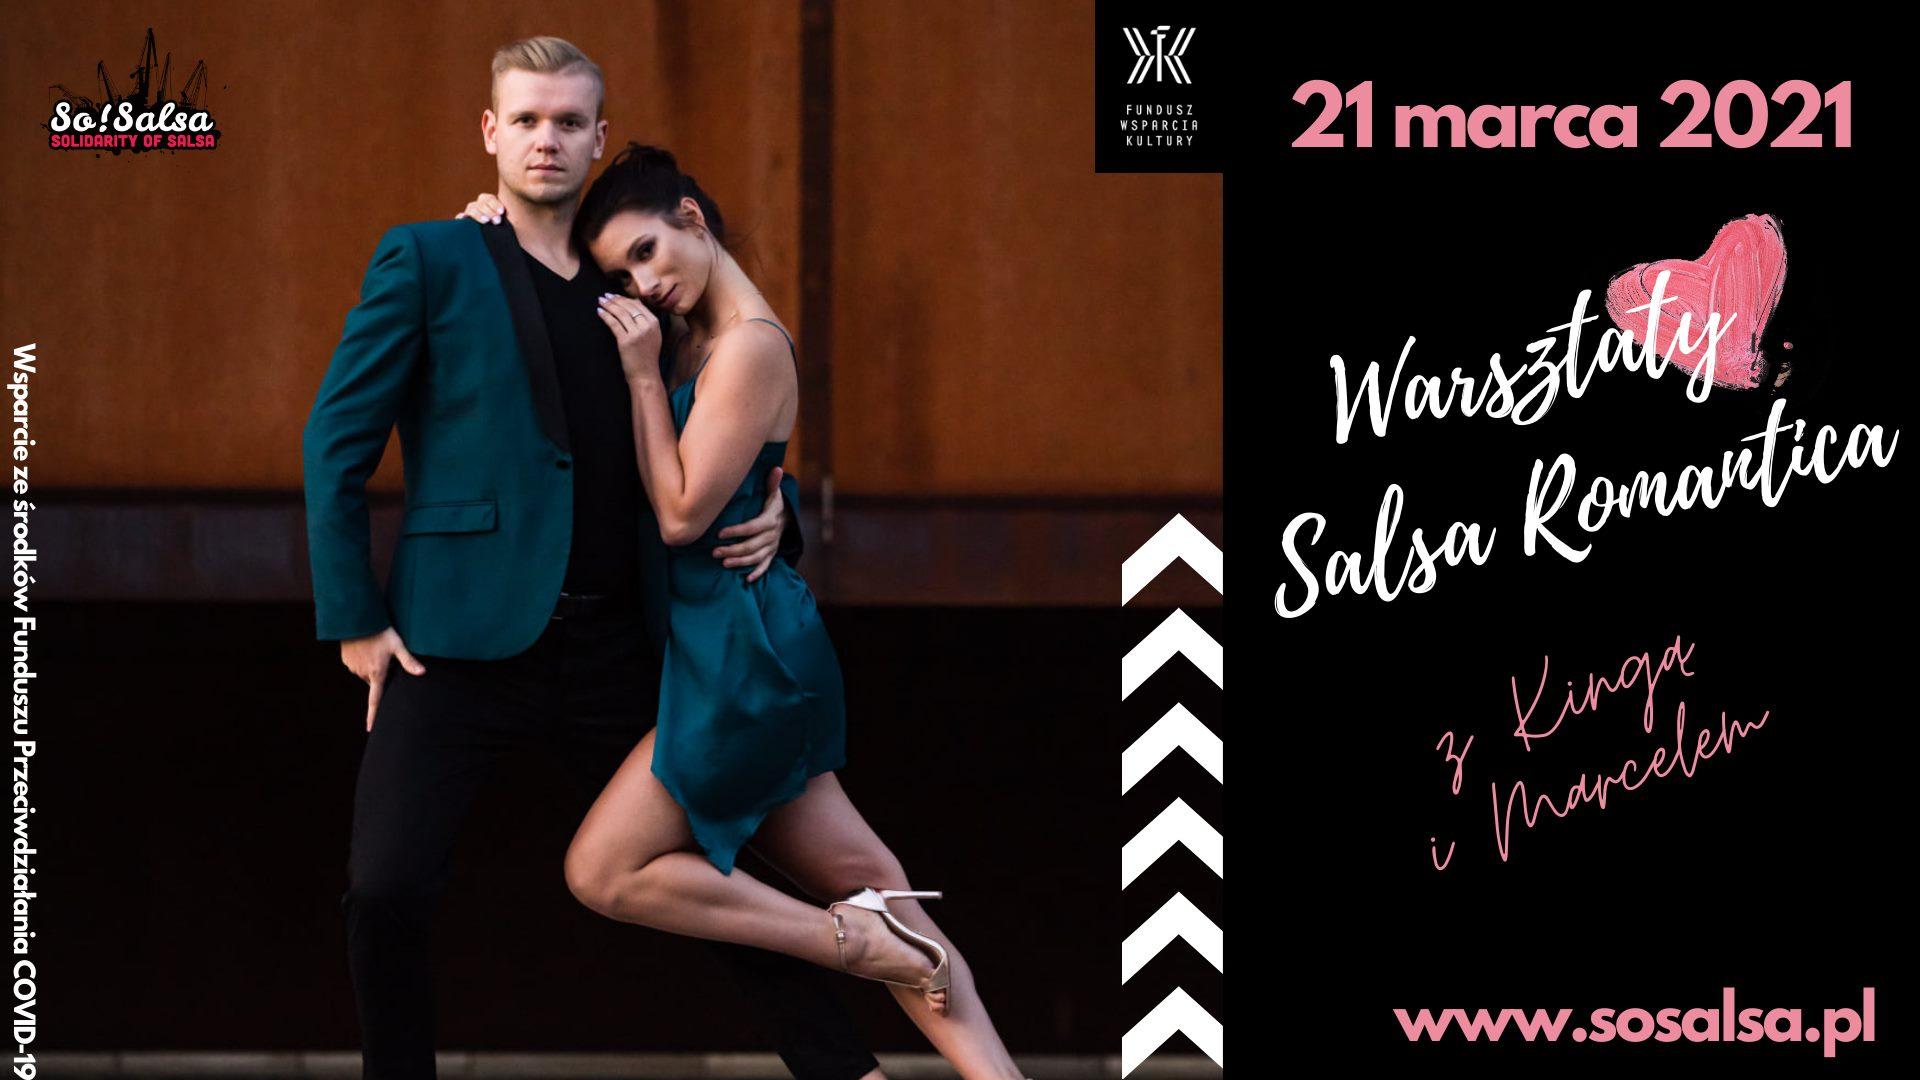 Warsztaty Salsa Romantica